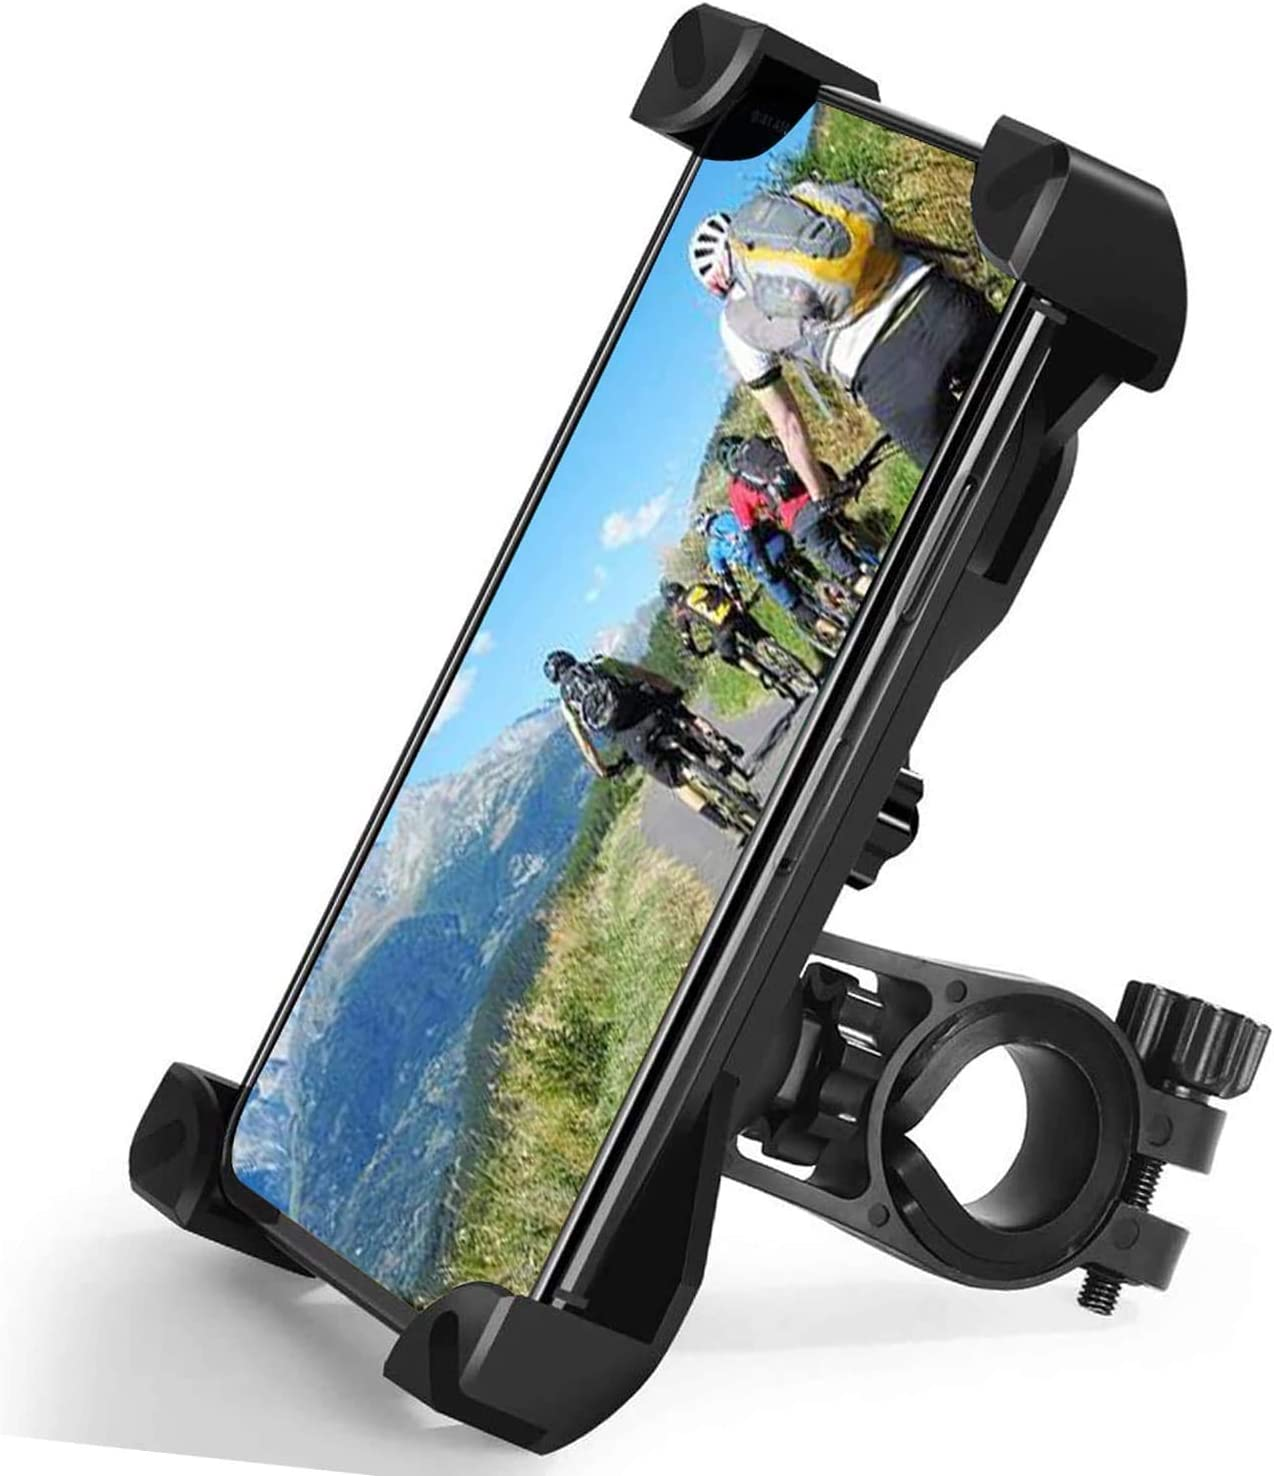 Zommuei Soporte Movil Bici, Soporte Movil Moto Universal 360°Rotación Anti Vibración Porta Telefono Motocicleta Montaña Soporte para iPhone Samsung LG HTC Motorola Xiaomi GPS y Otro 4.5-7.0